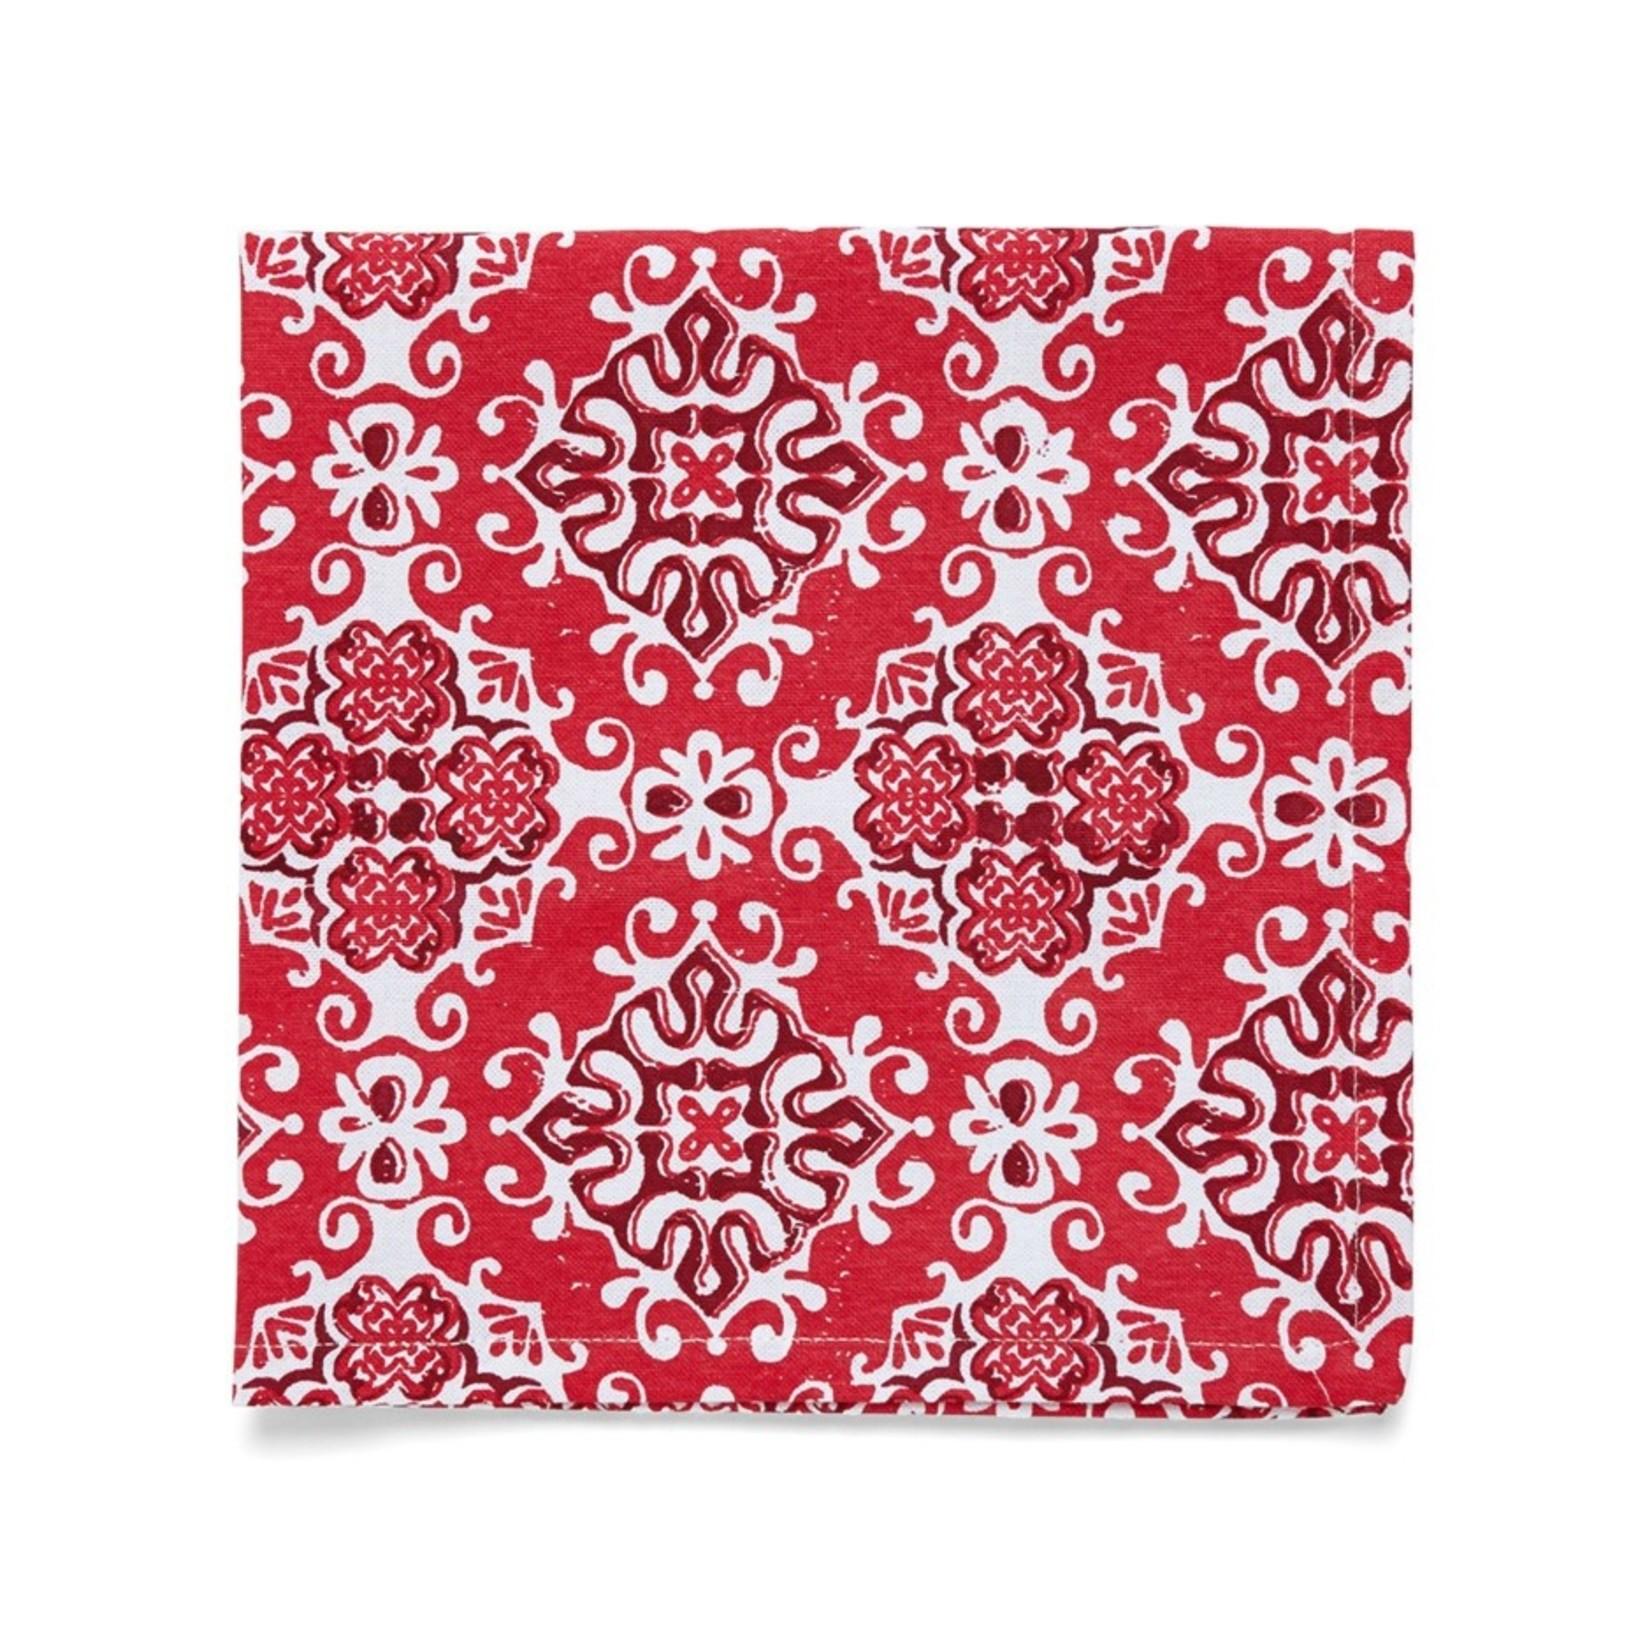 ARTISAN NAPKIN S4 18X18 RED -Set of 4